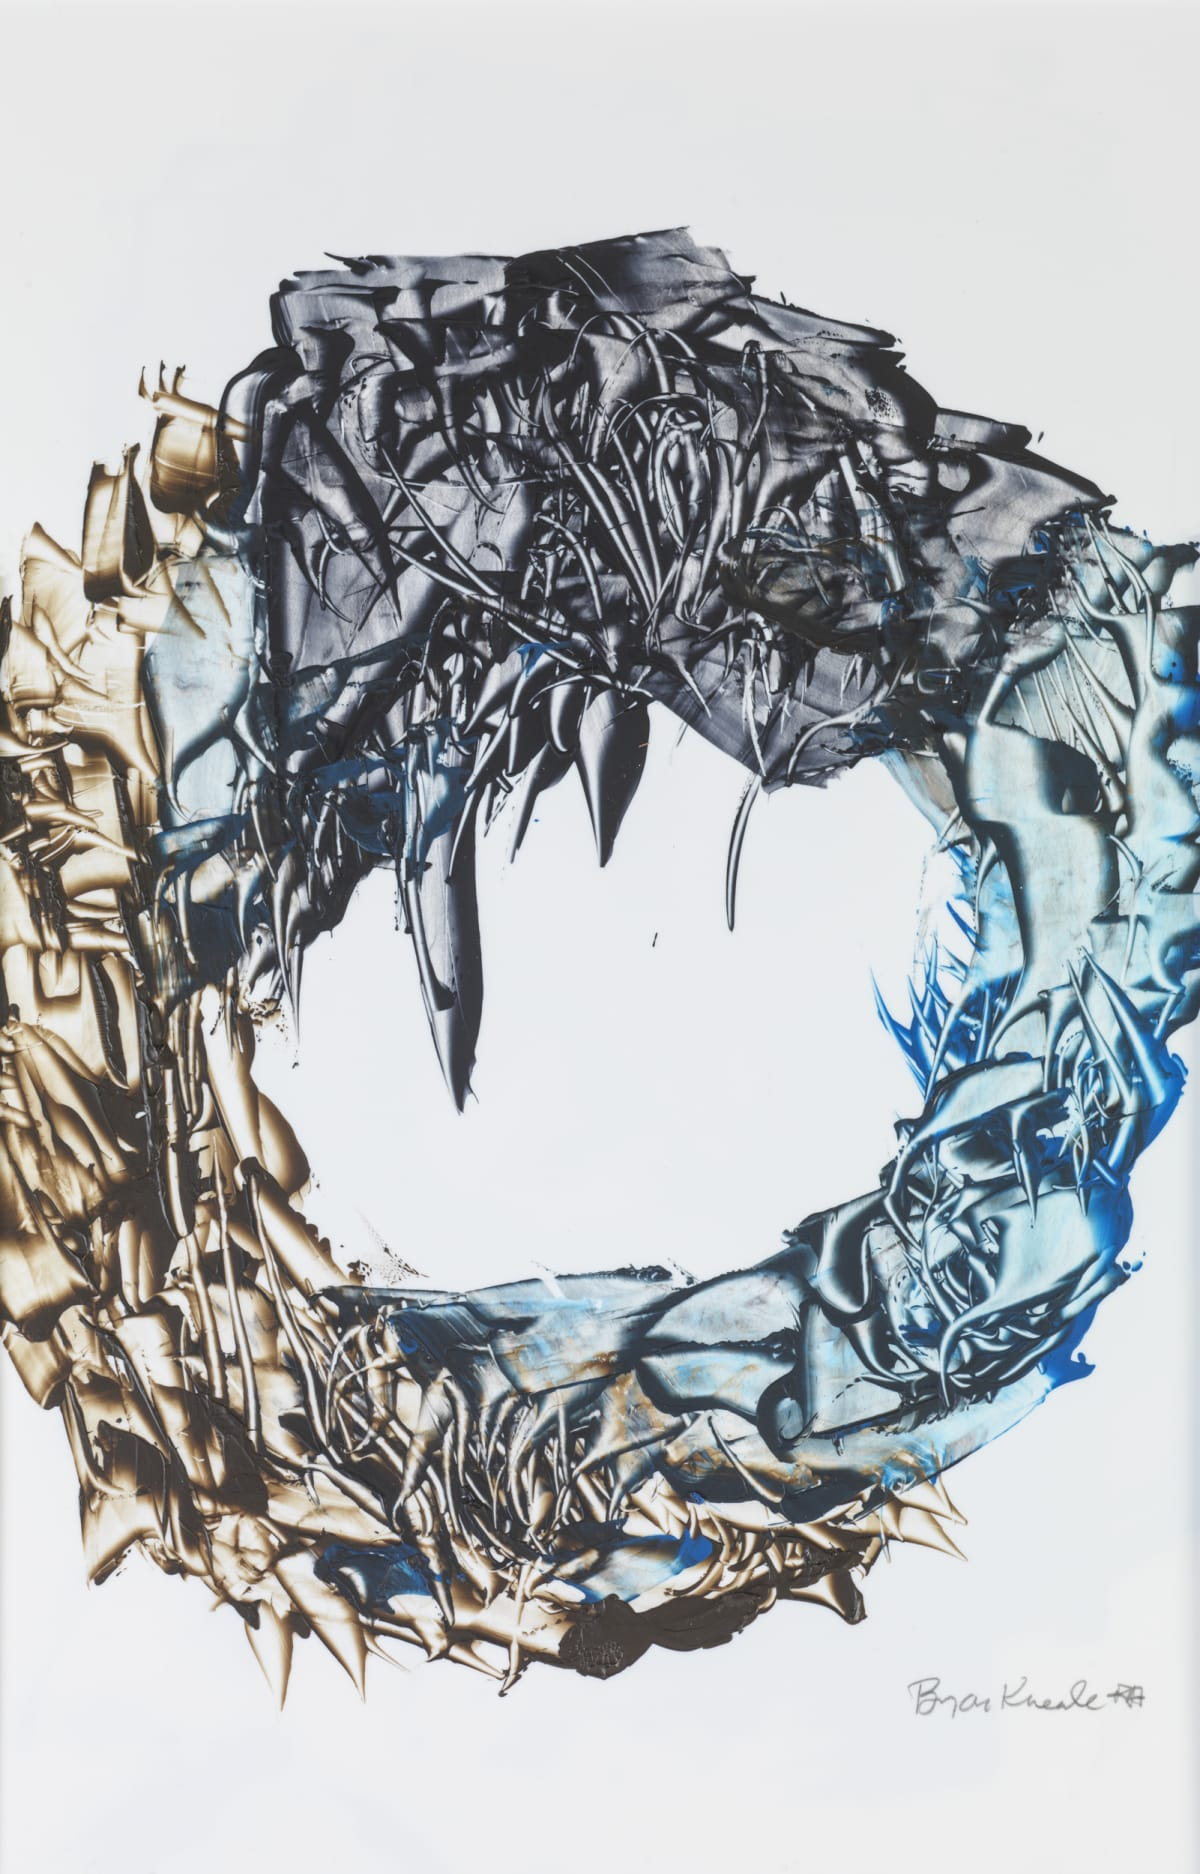 Bryan Kneale, Revolving Blue, 2018